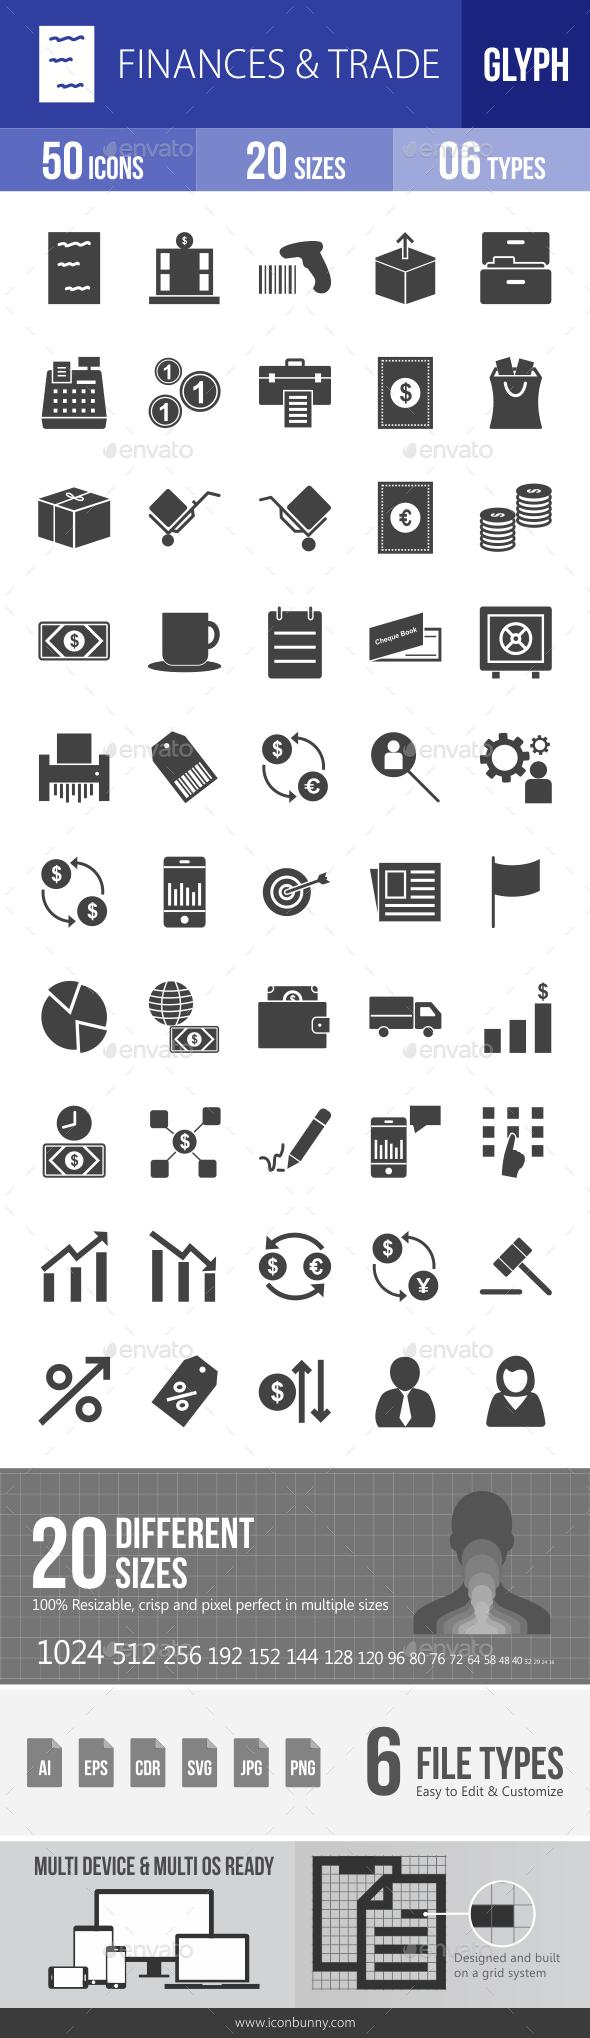 Finances & Trade Glyph Icons - Icons